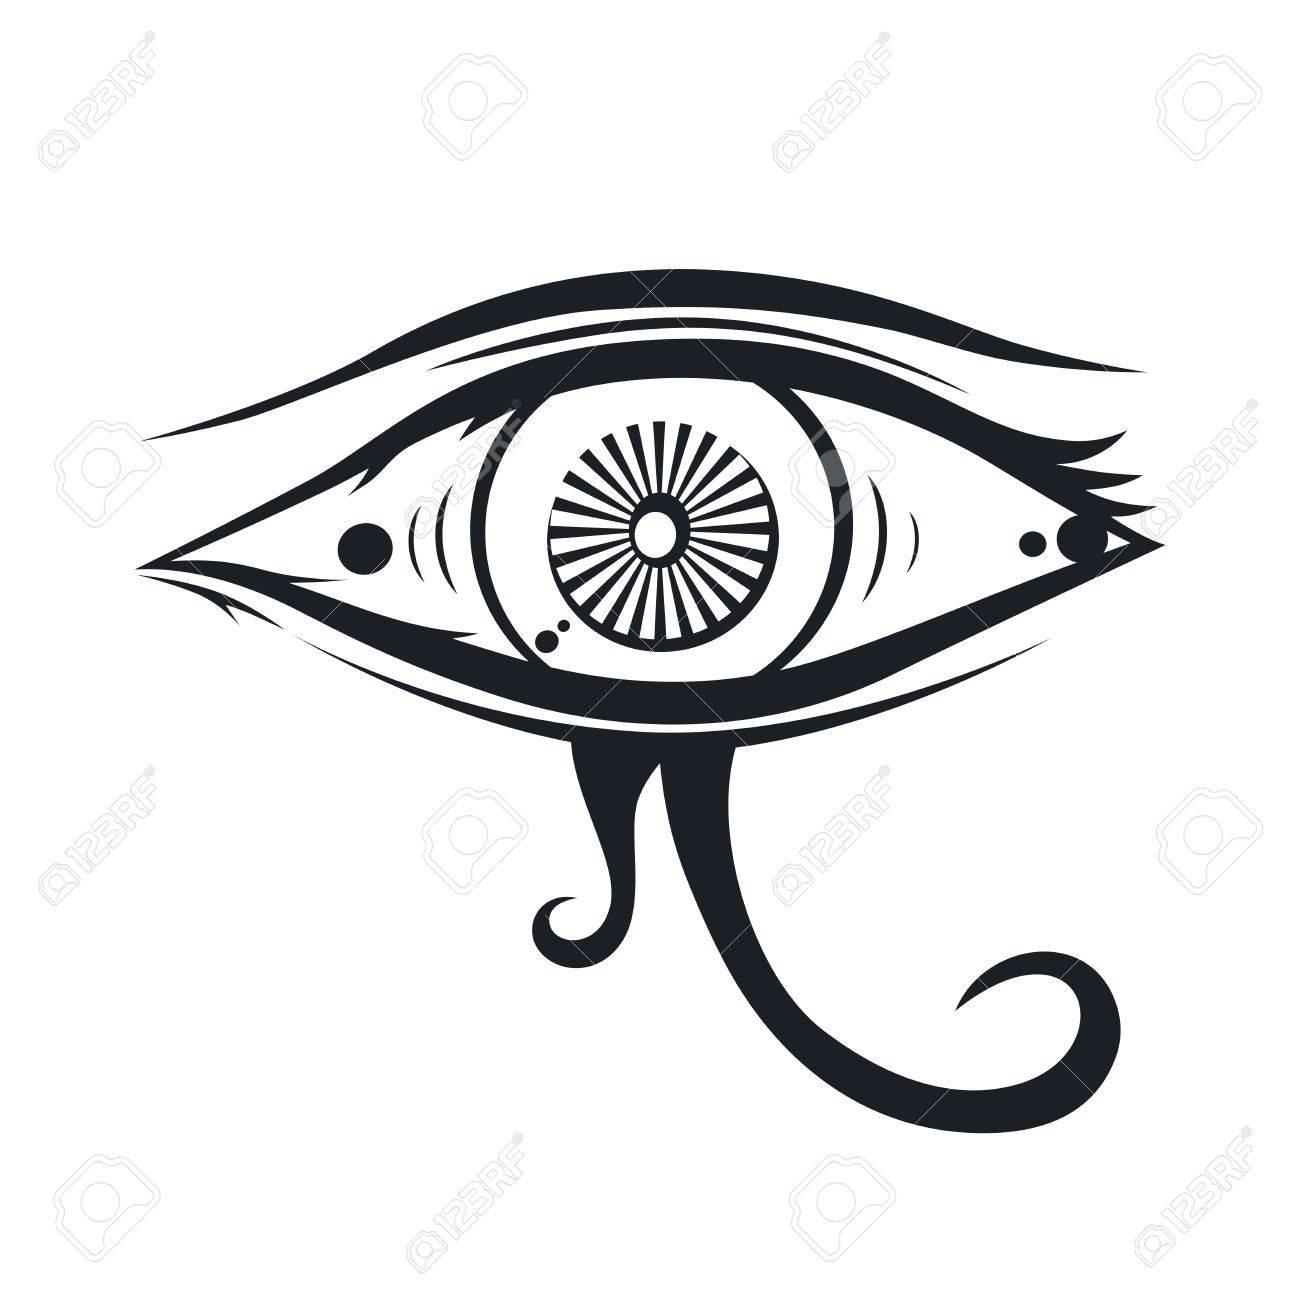 1300x1300 Horus One Eye Theme Vector Art Illustration Royalty Free Cliparts